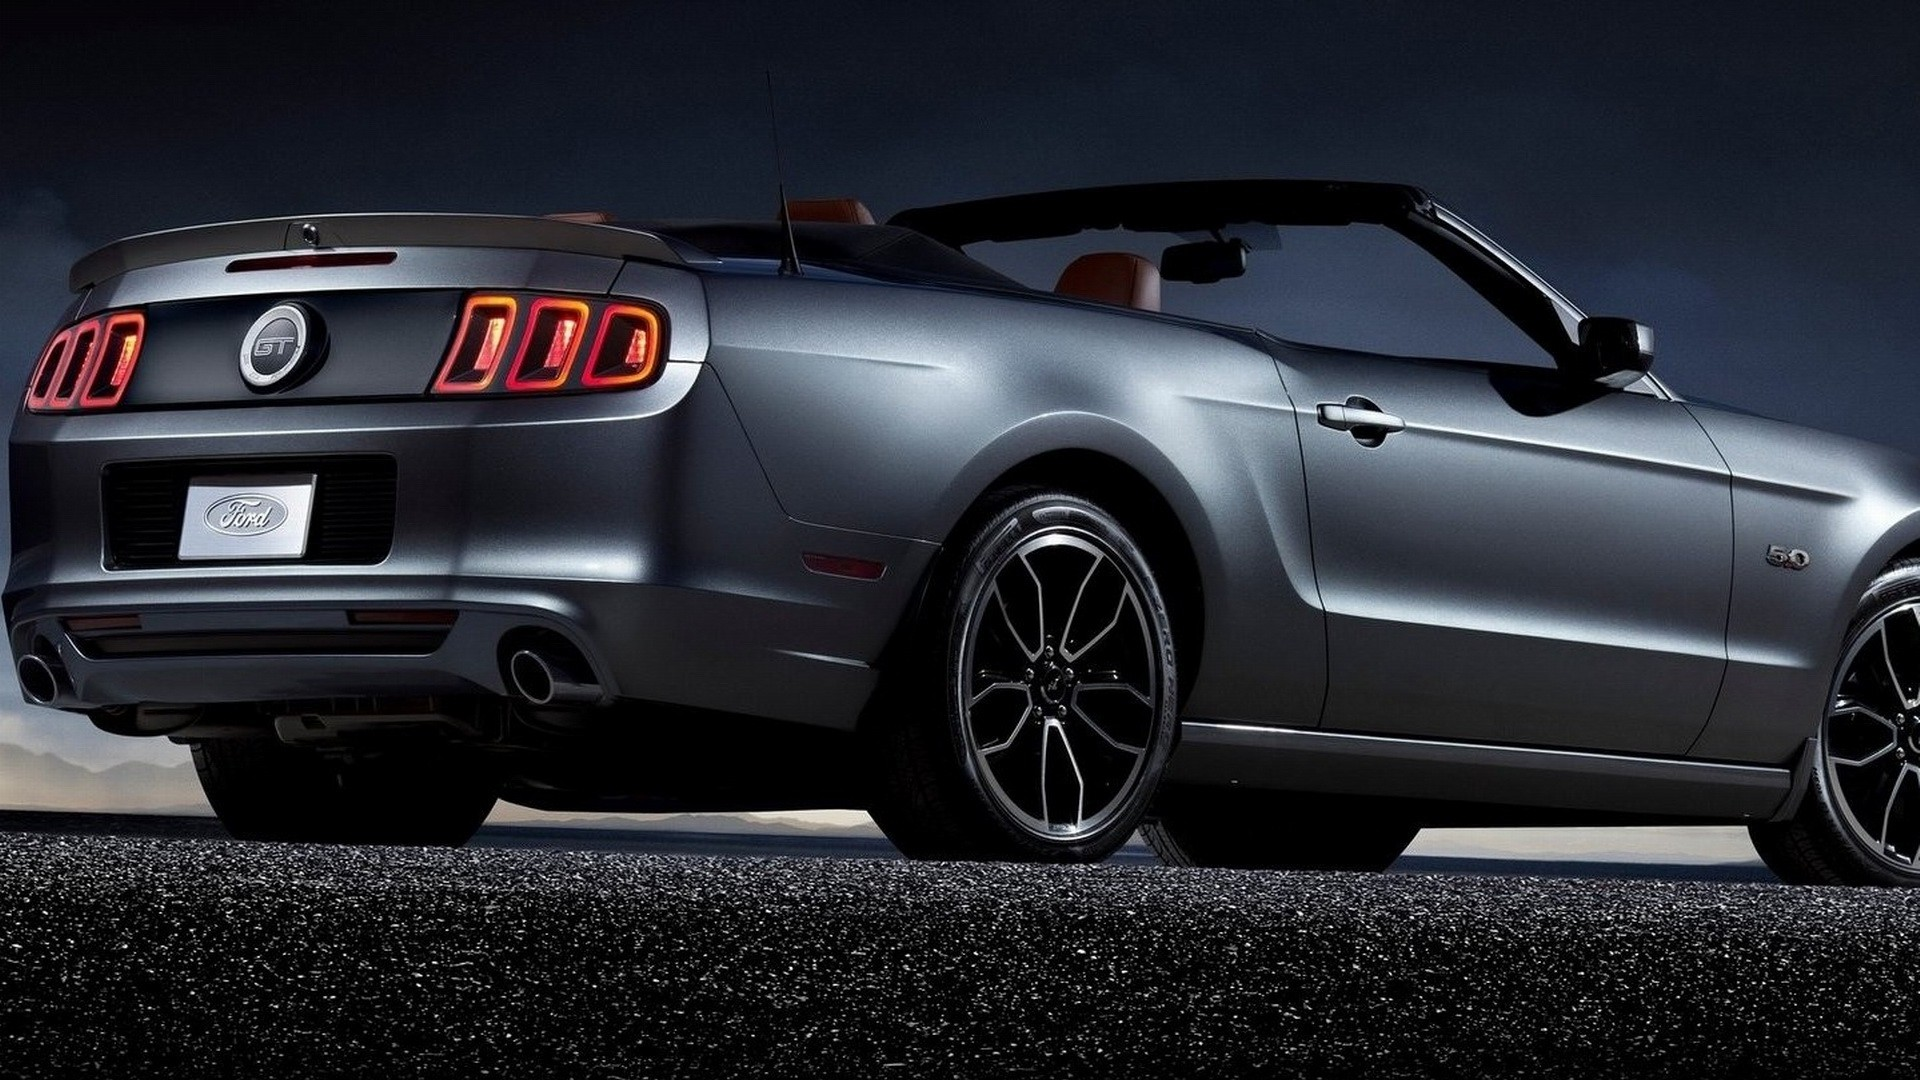 Mustang GT 2013 1920x1080 WallpapersFord Mustang 1920x1080 Wallpapers 1920x1080